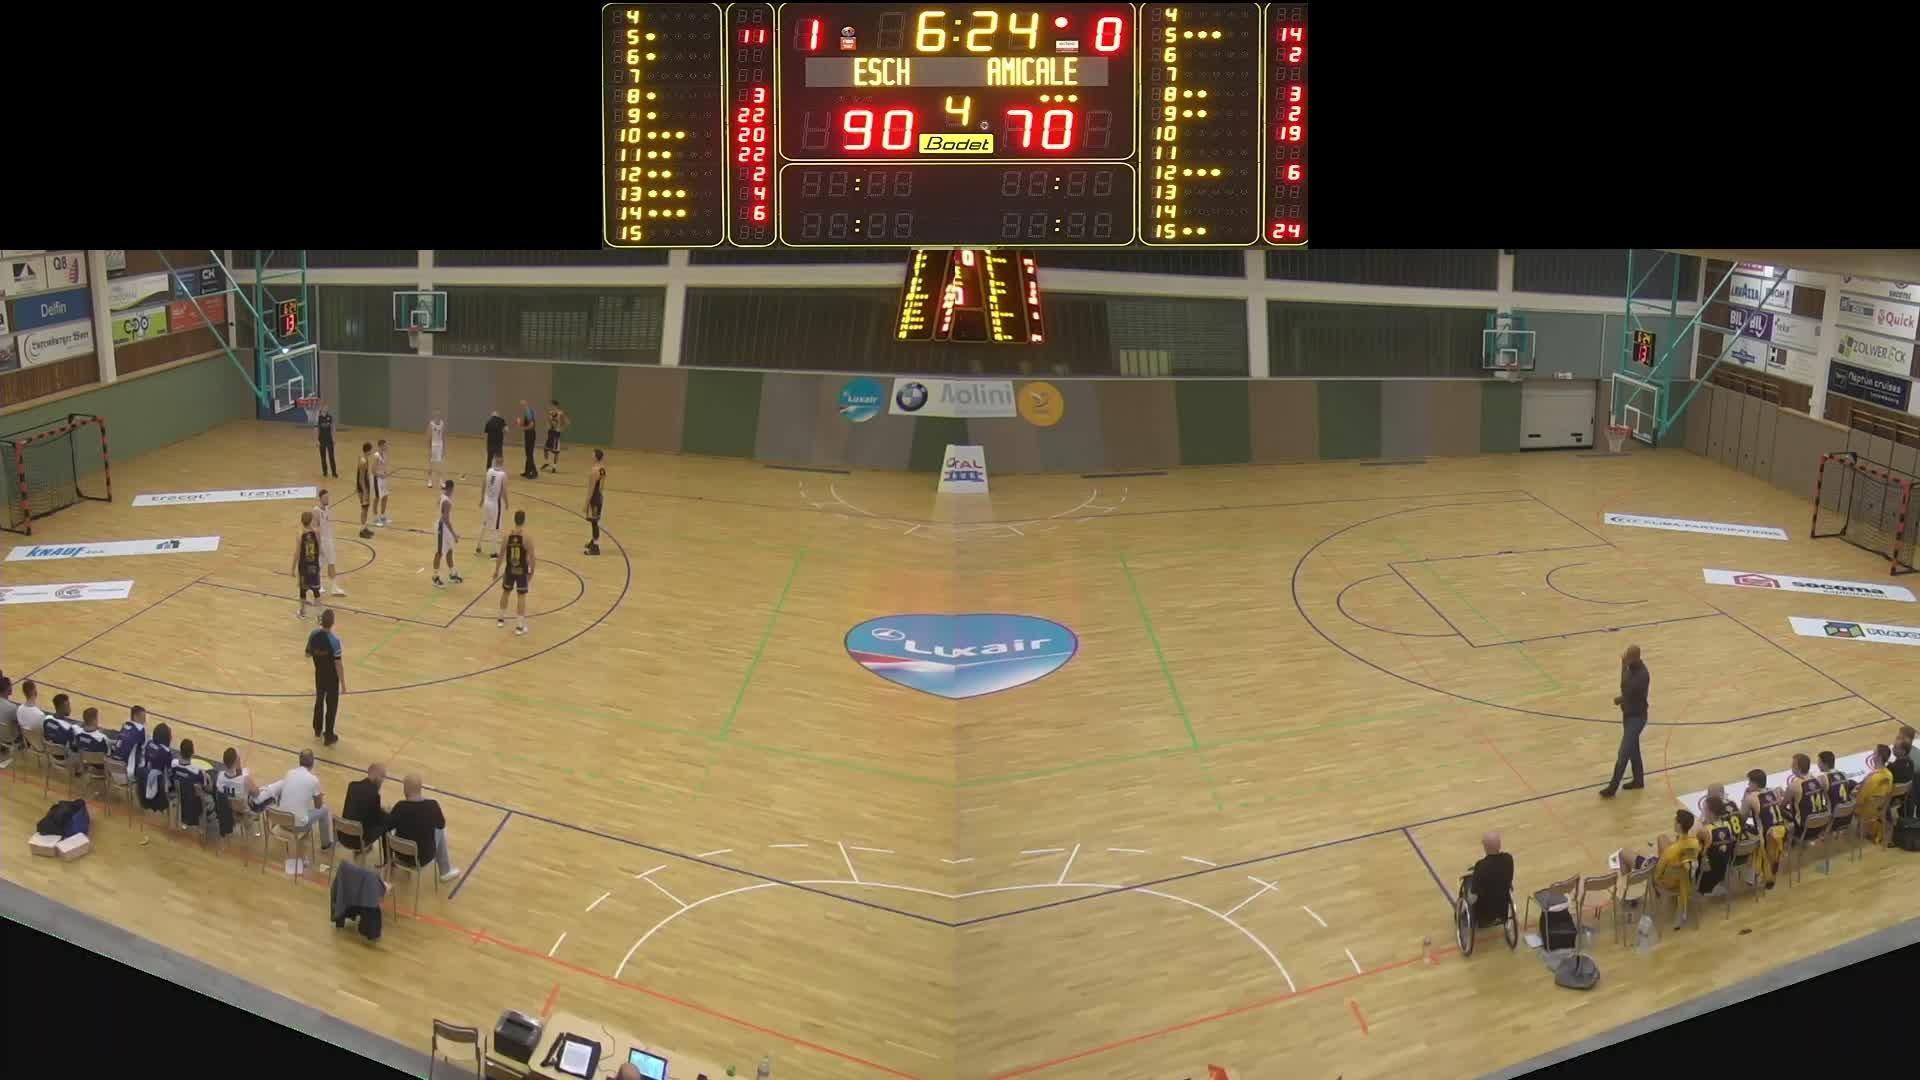 Basket Esch ( Seniors A ) - Amicale - 26.10.2019